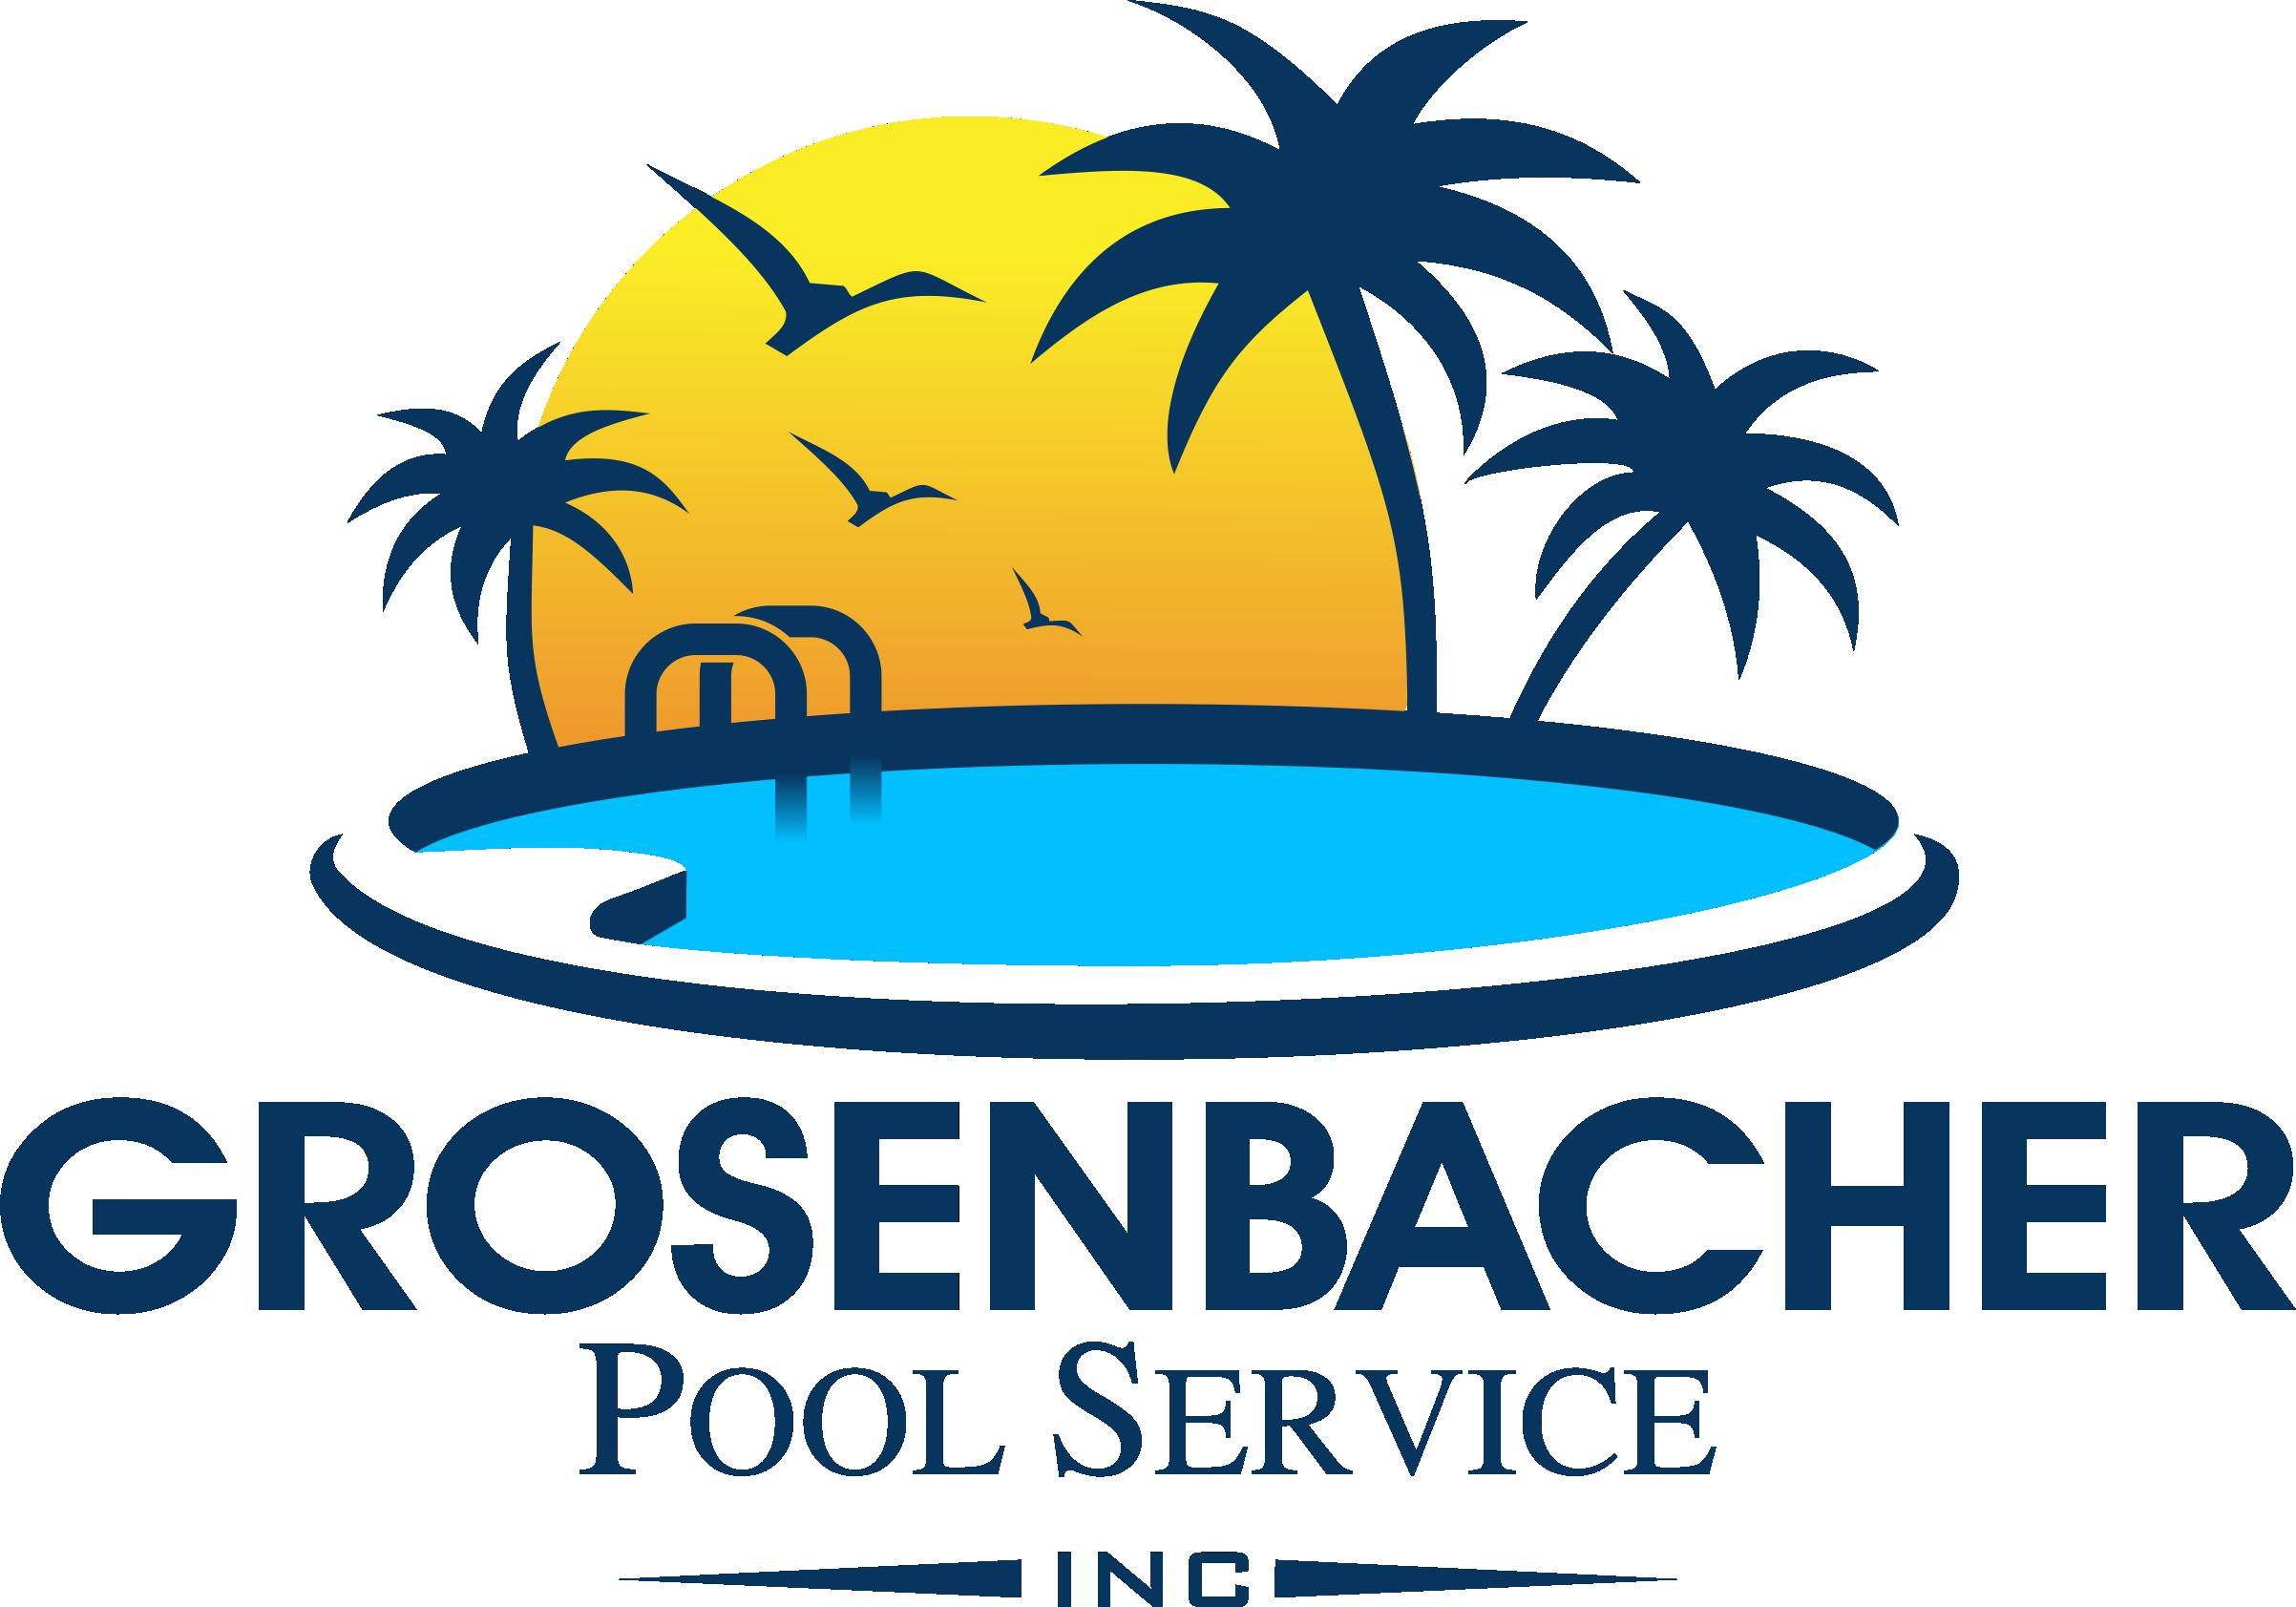 Grosenbacher Pool Service